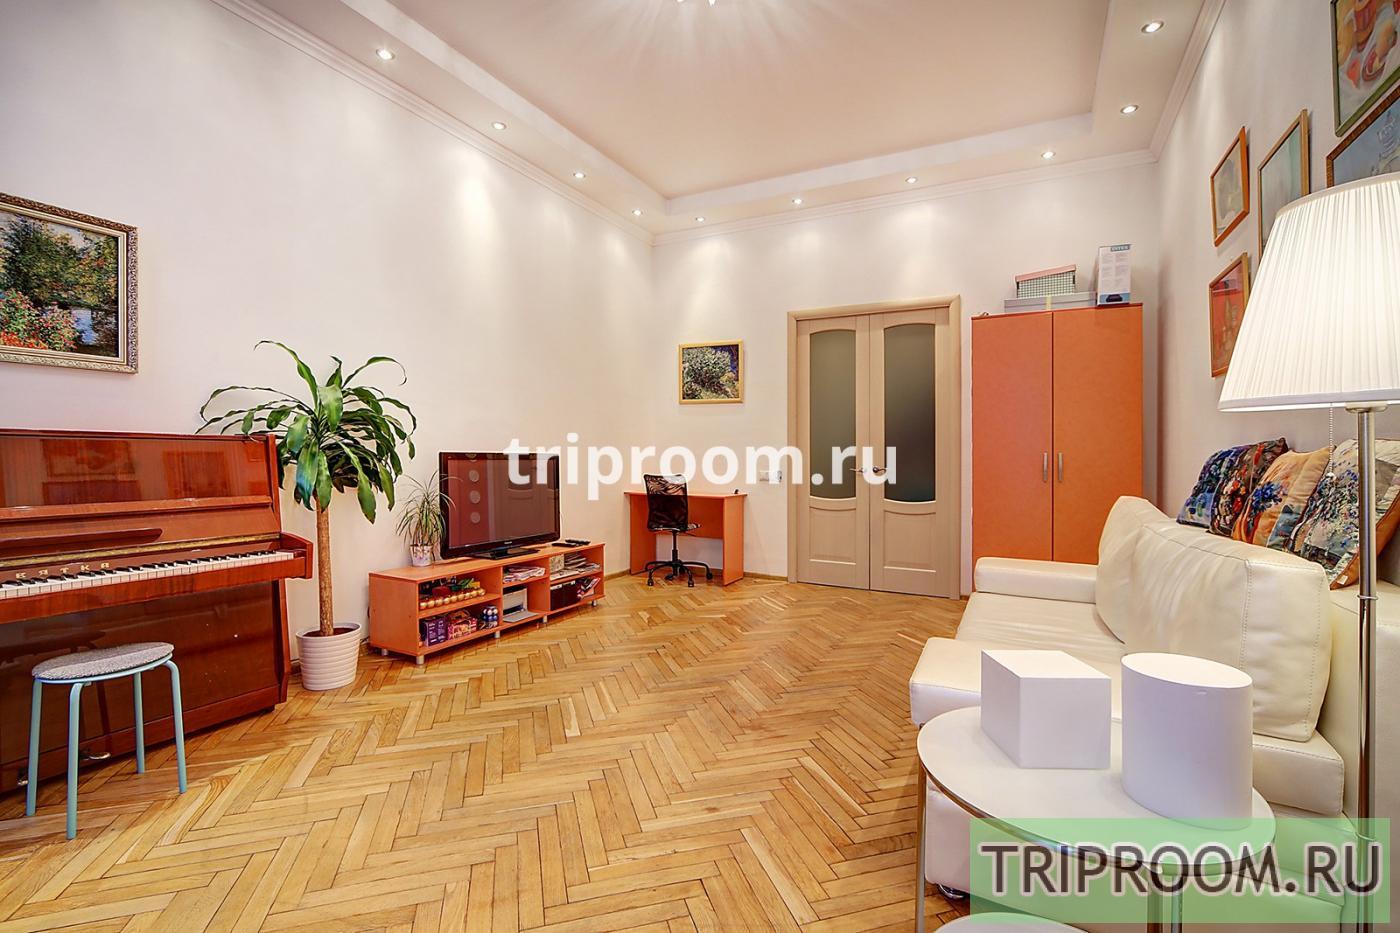 2-комнатная квартира посуточно (вариант № 15426), ул. Лиговский проспект, фото № 8